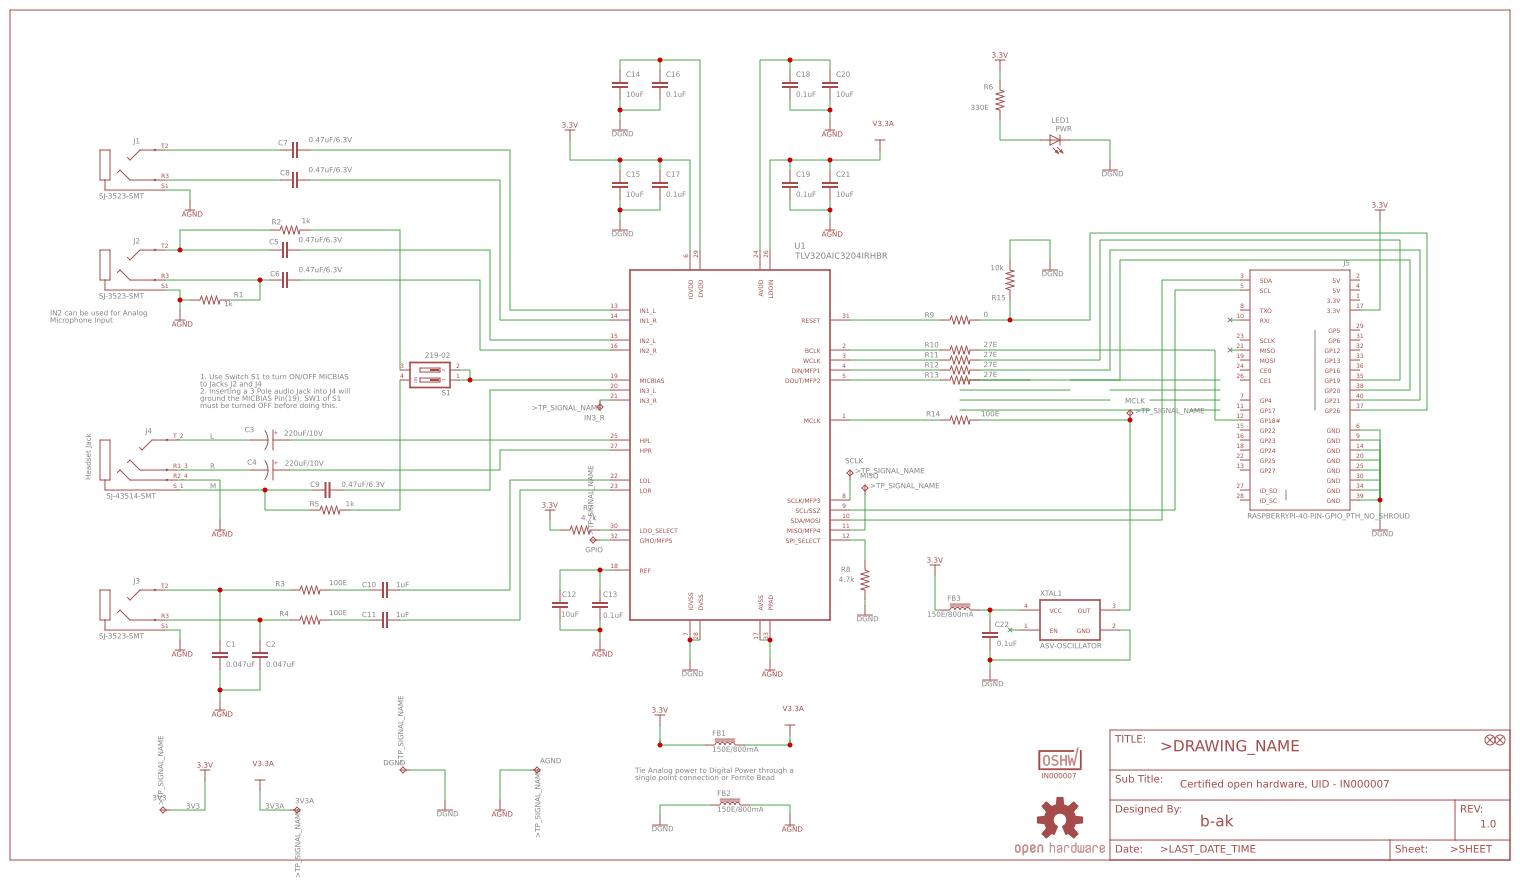 Eagle V9 2 0 schematic converted to V7x import - EasyEDA